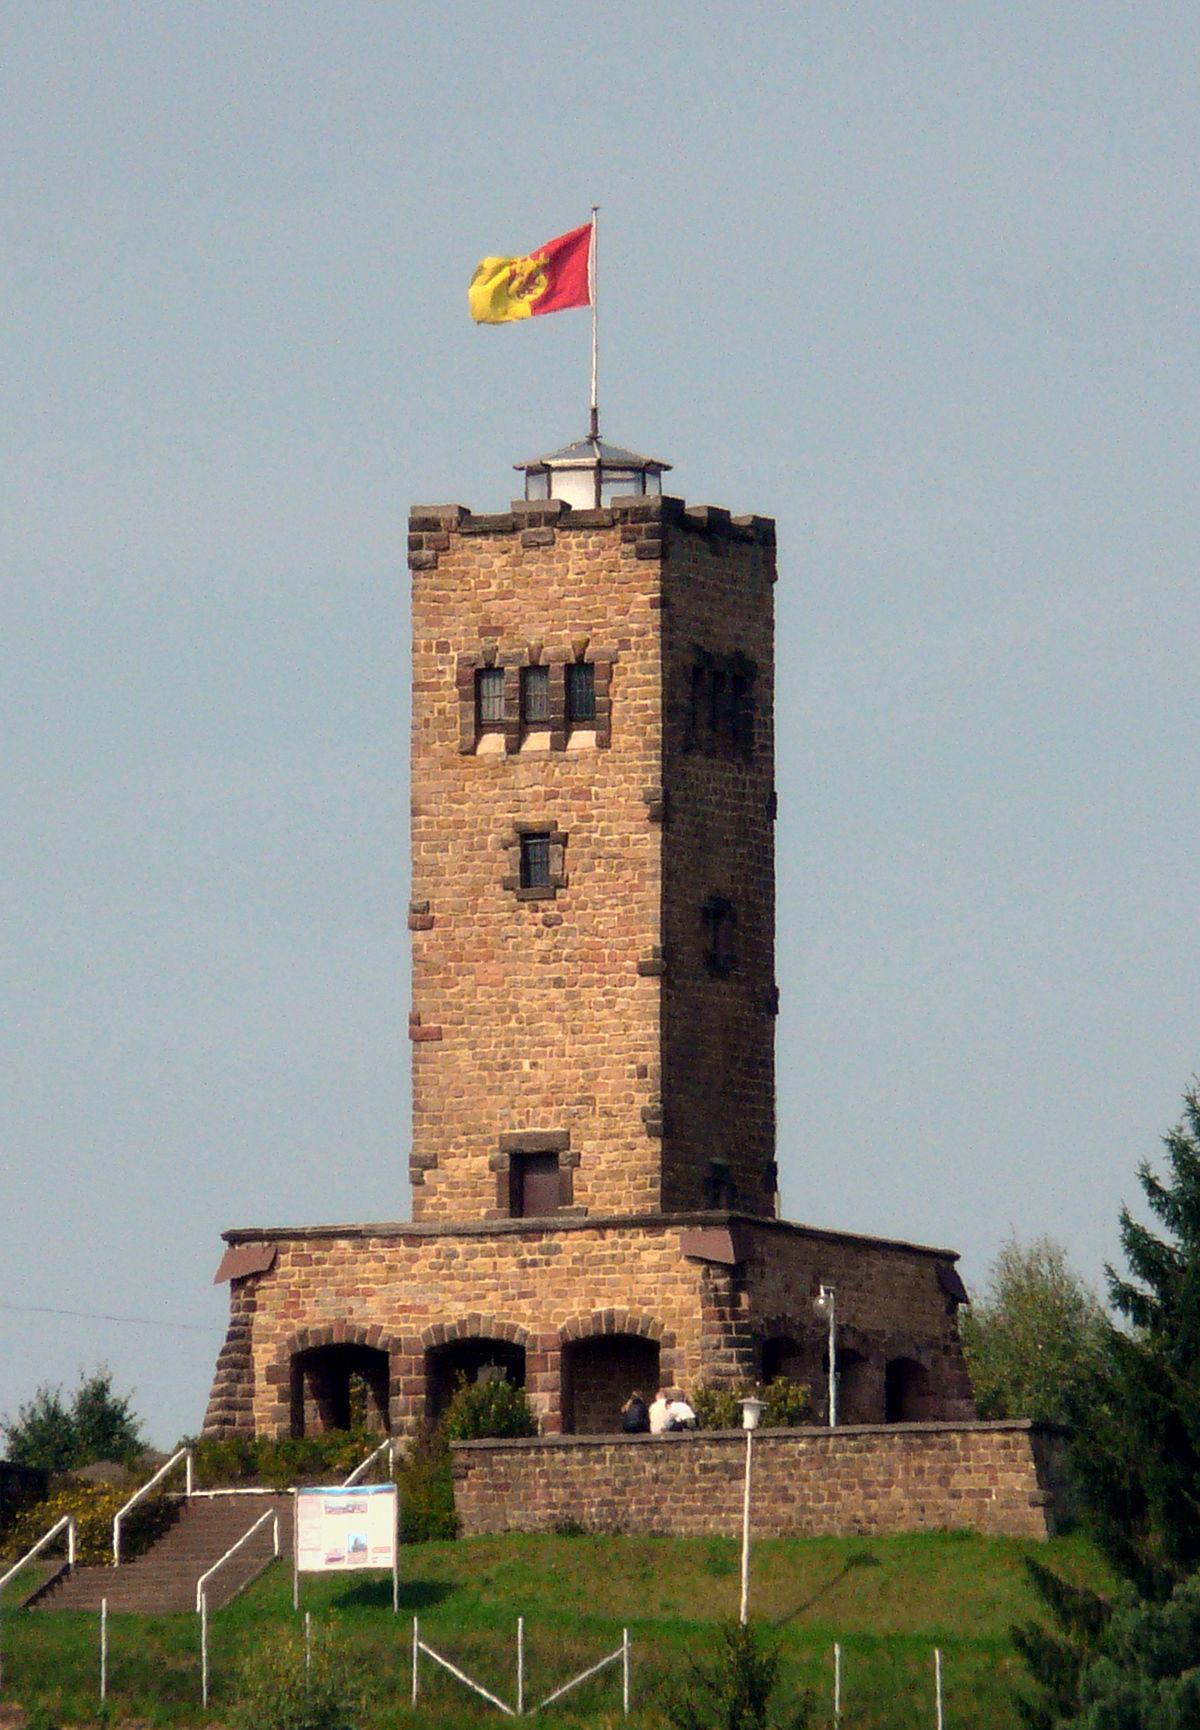 Spiesen-Elversberg Deutschland